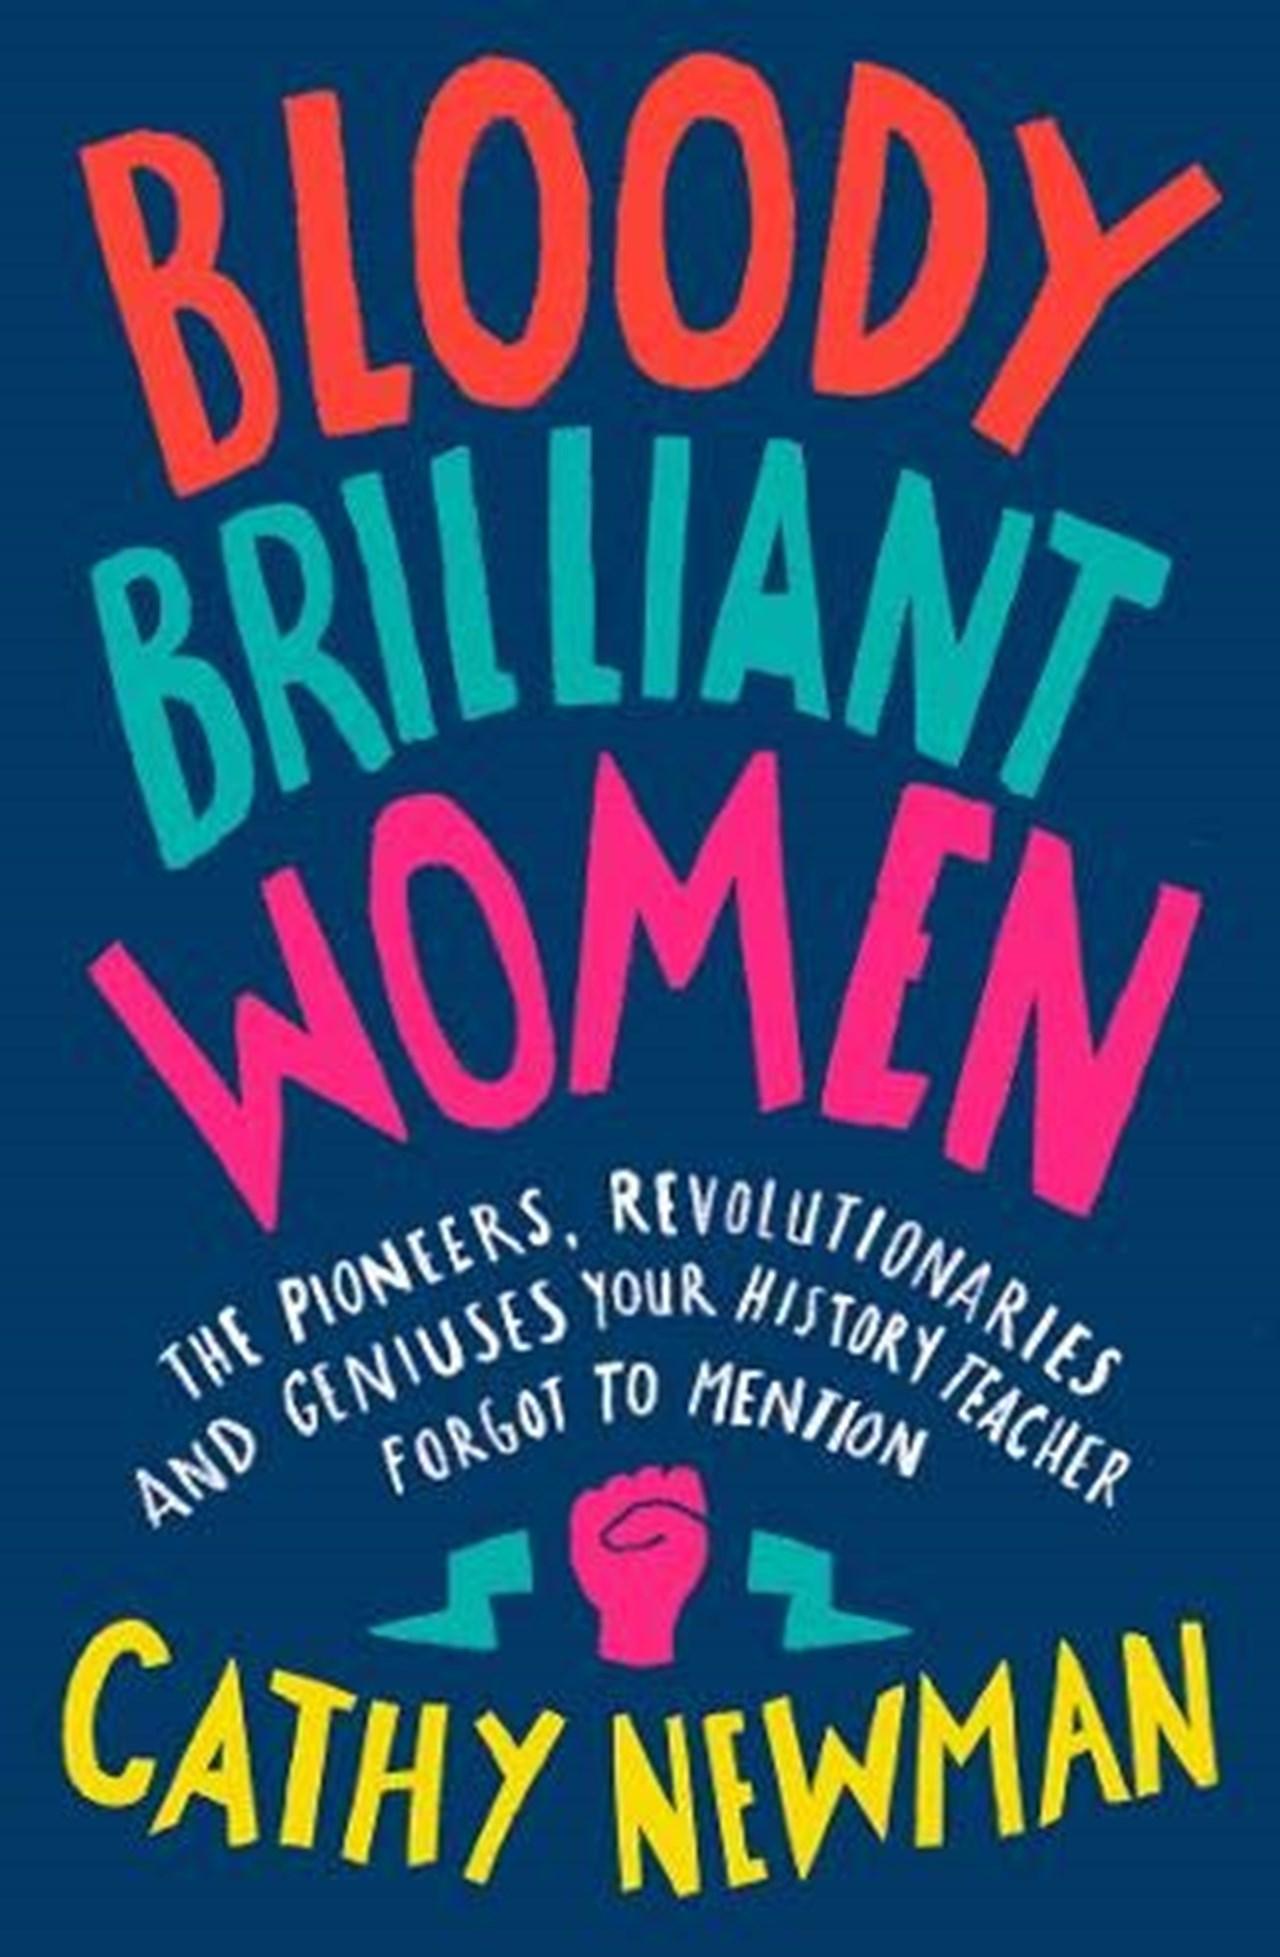 Bloody Brilliant Women - 1